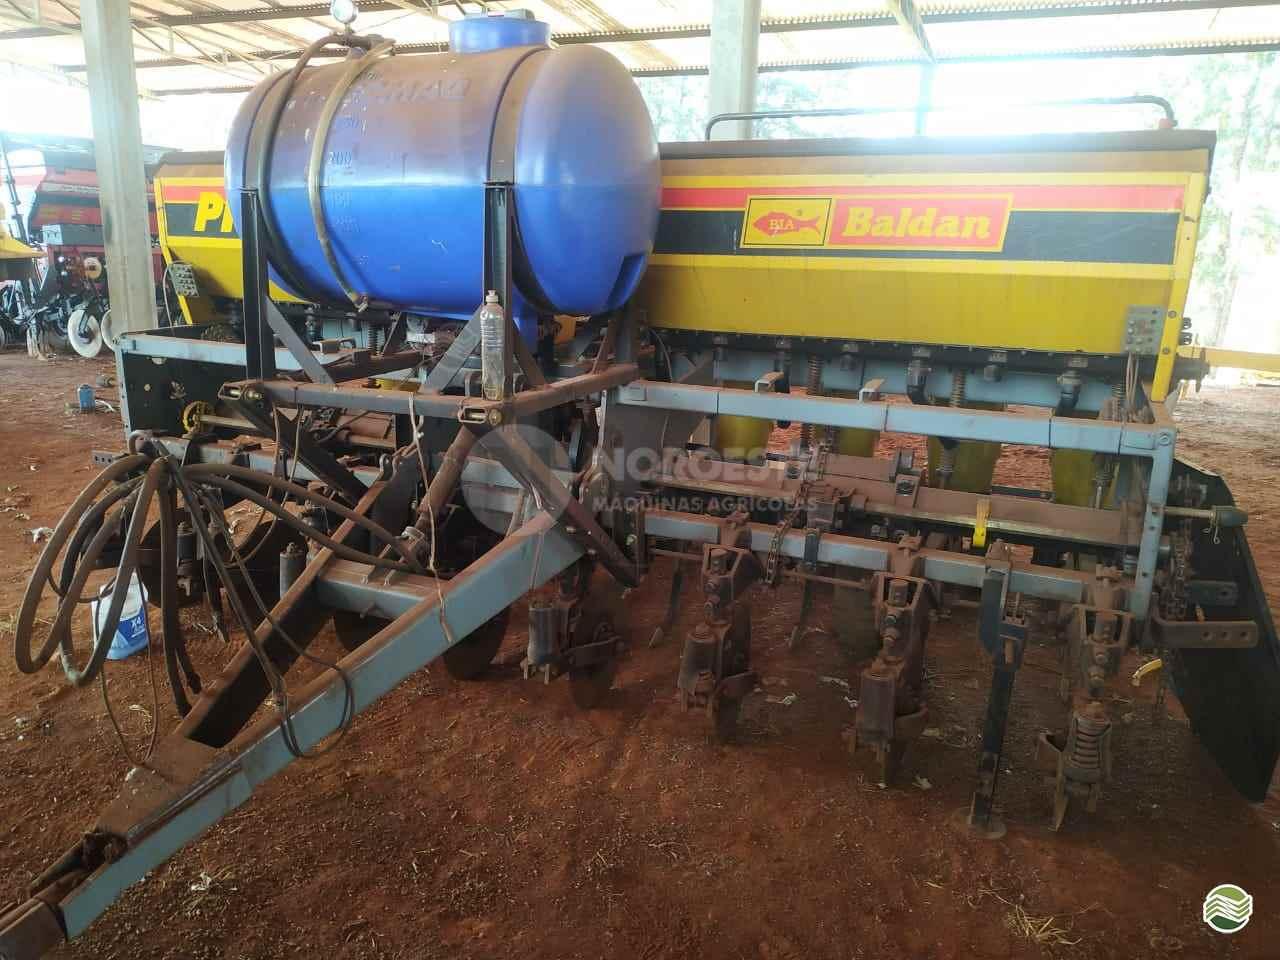 PLANTADEIRA BALDAN BALDAN PP4000 Noroeste Máquinas Agrícolas CIANORTE PARANÁ PR